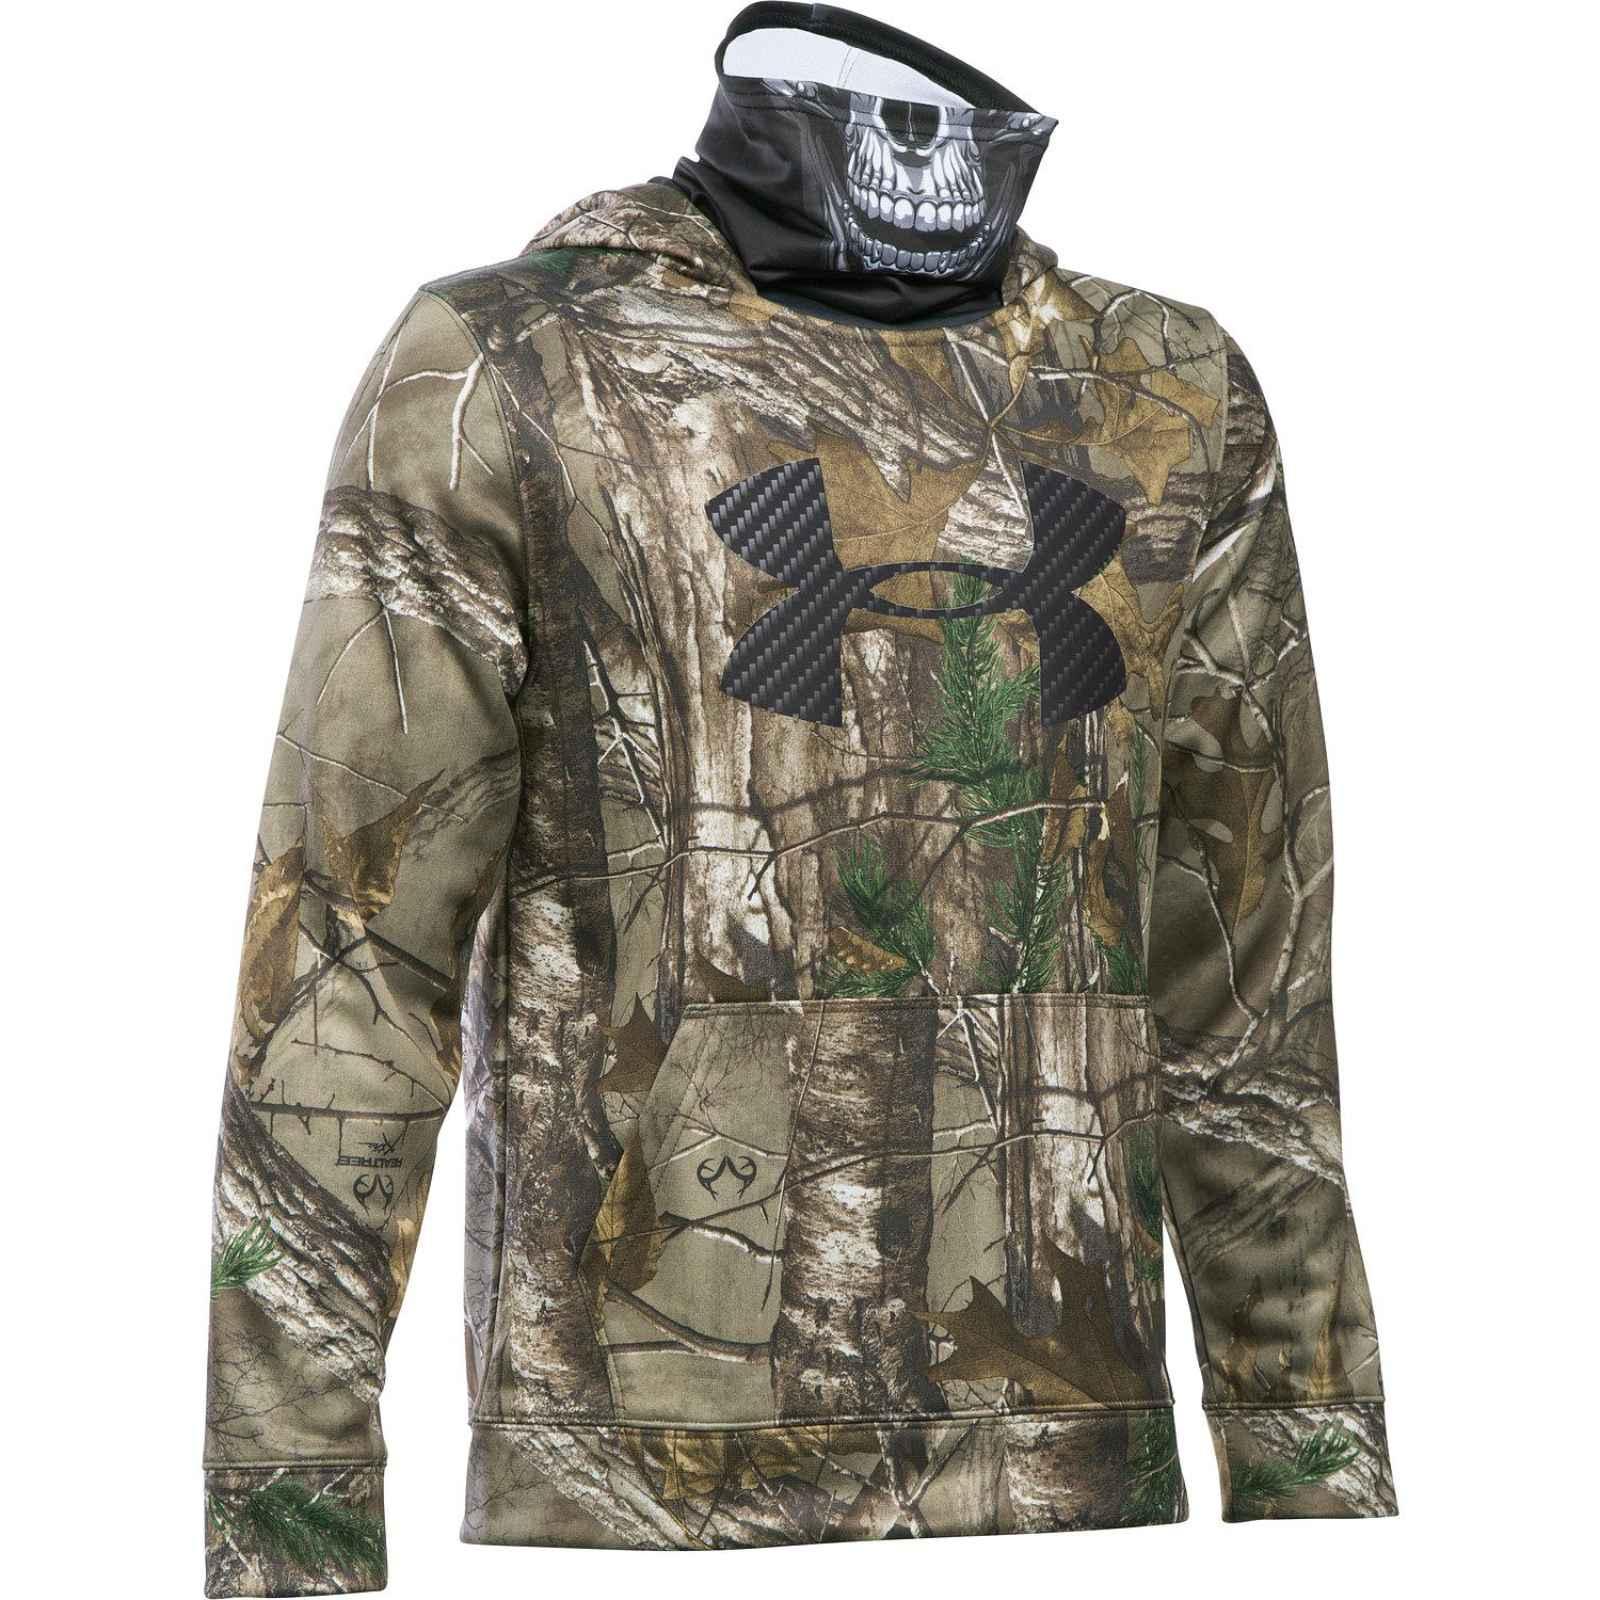 Under Armour 1285122 Boys' skull mask hooded jacket RXT